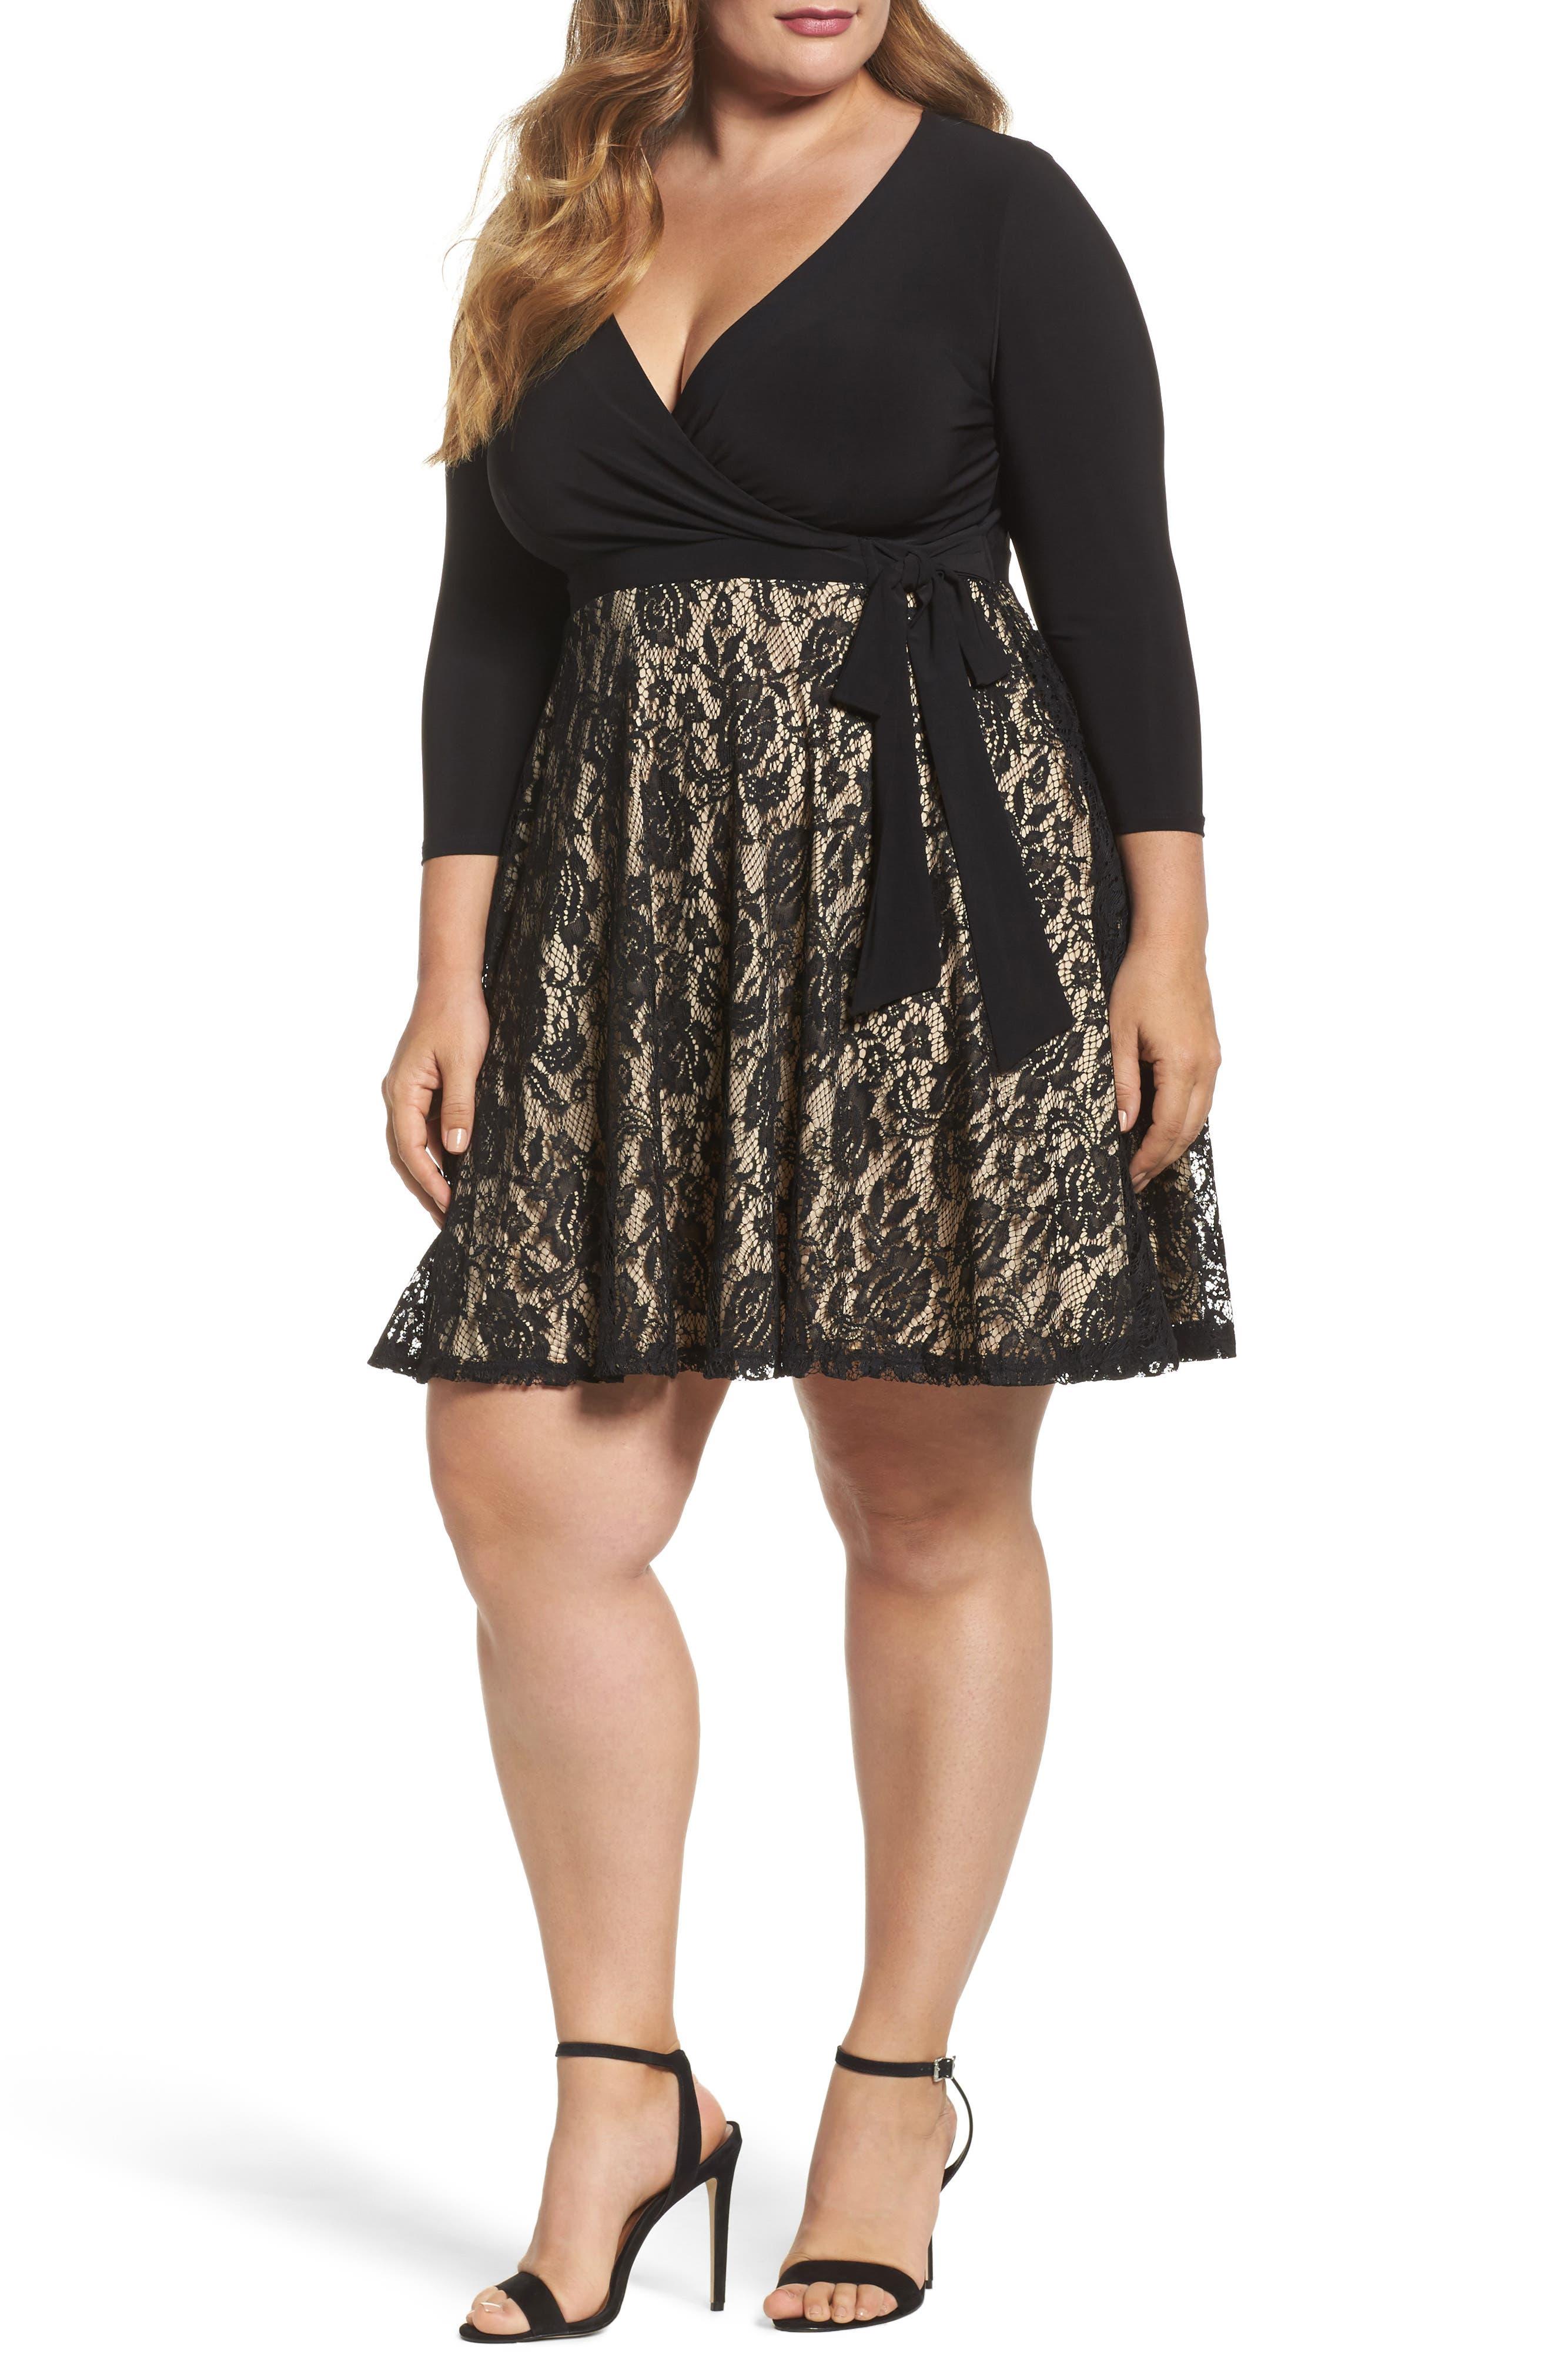 Main Image - Soprano Lace Skirt Skater Dress